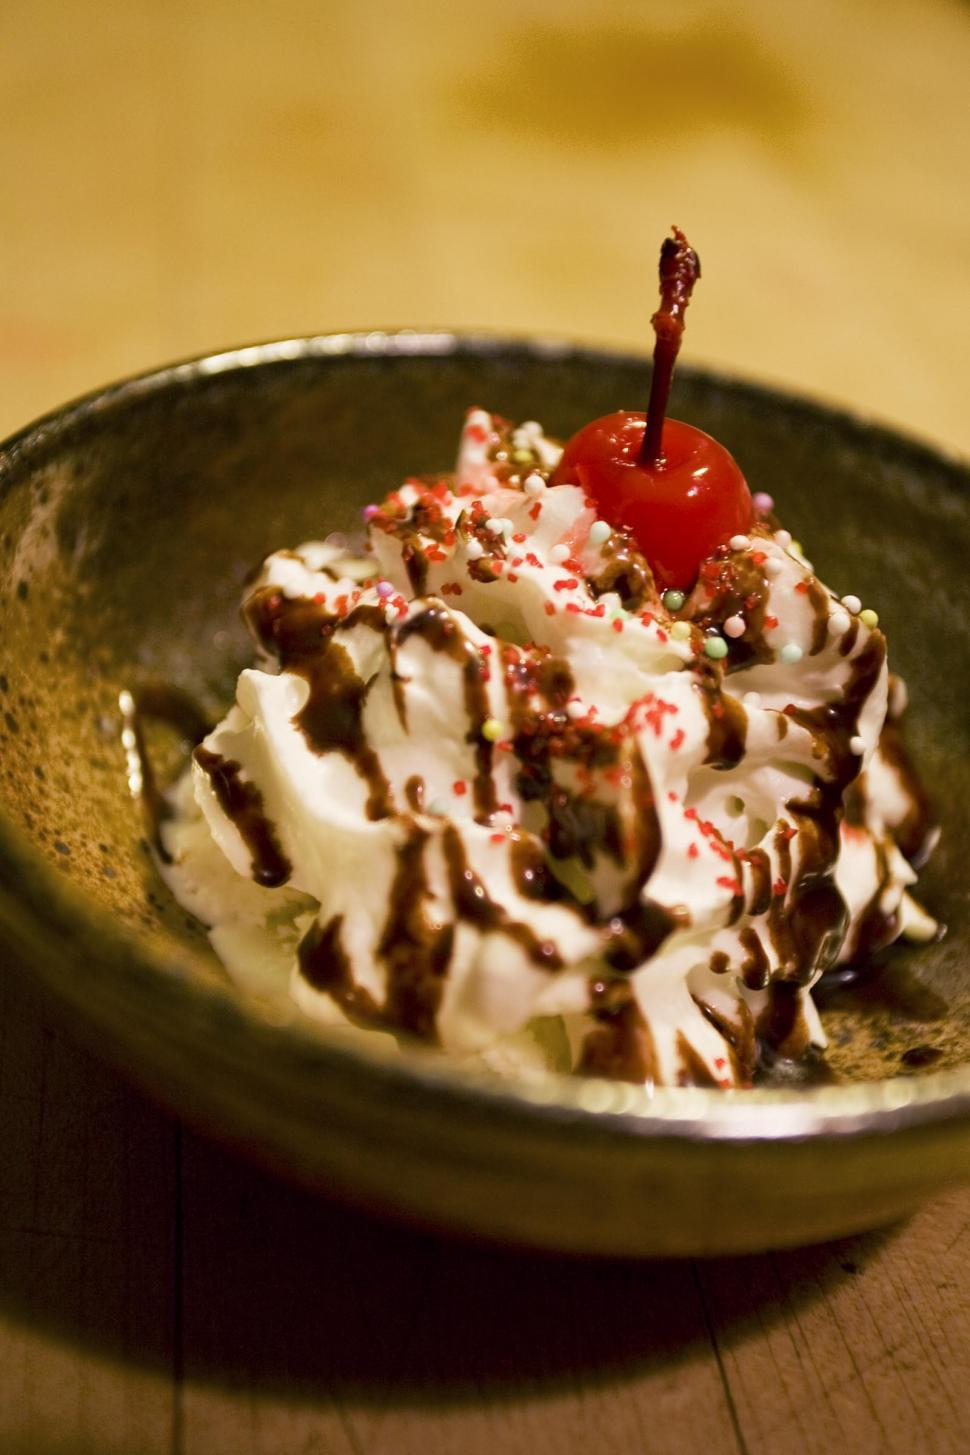 Download Free Stock HD Photo of Ice Cream dessert sundae Online